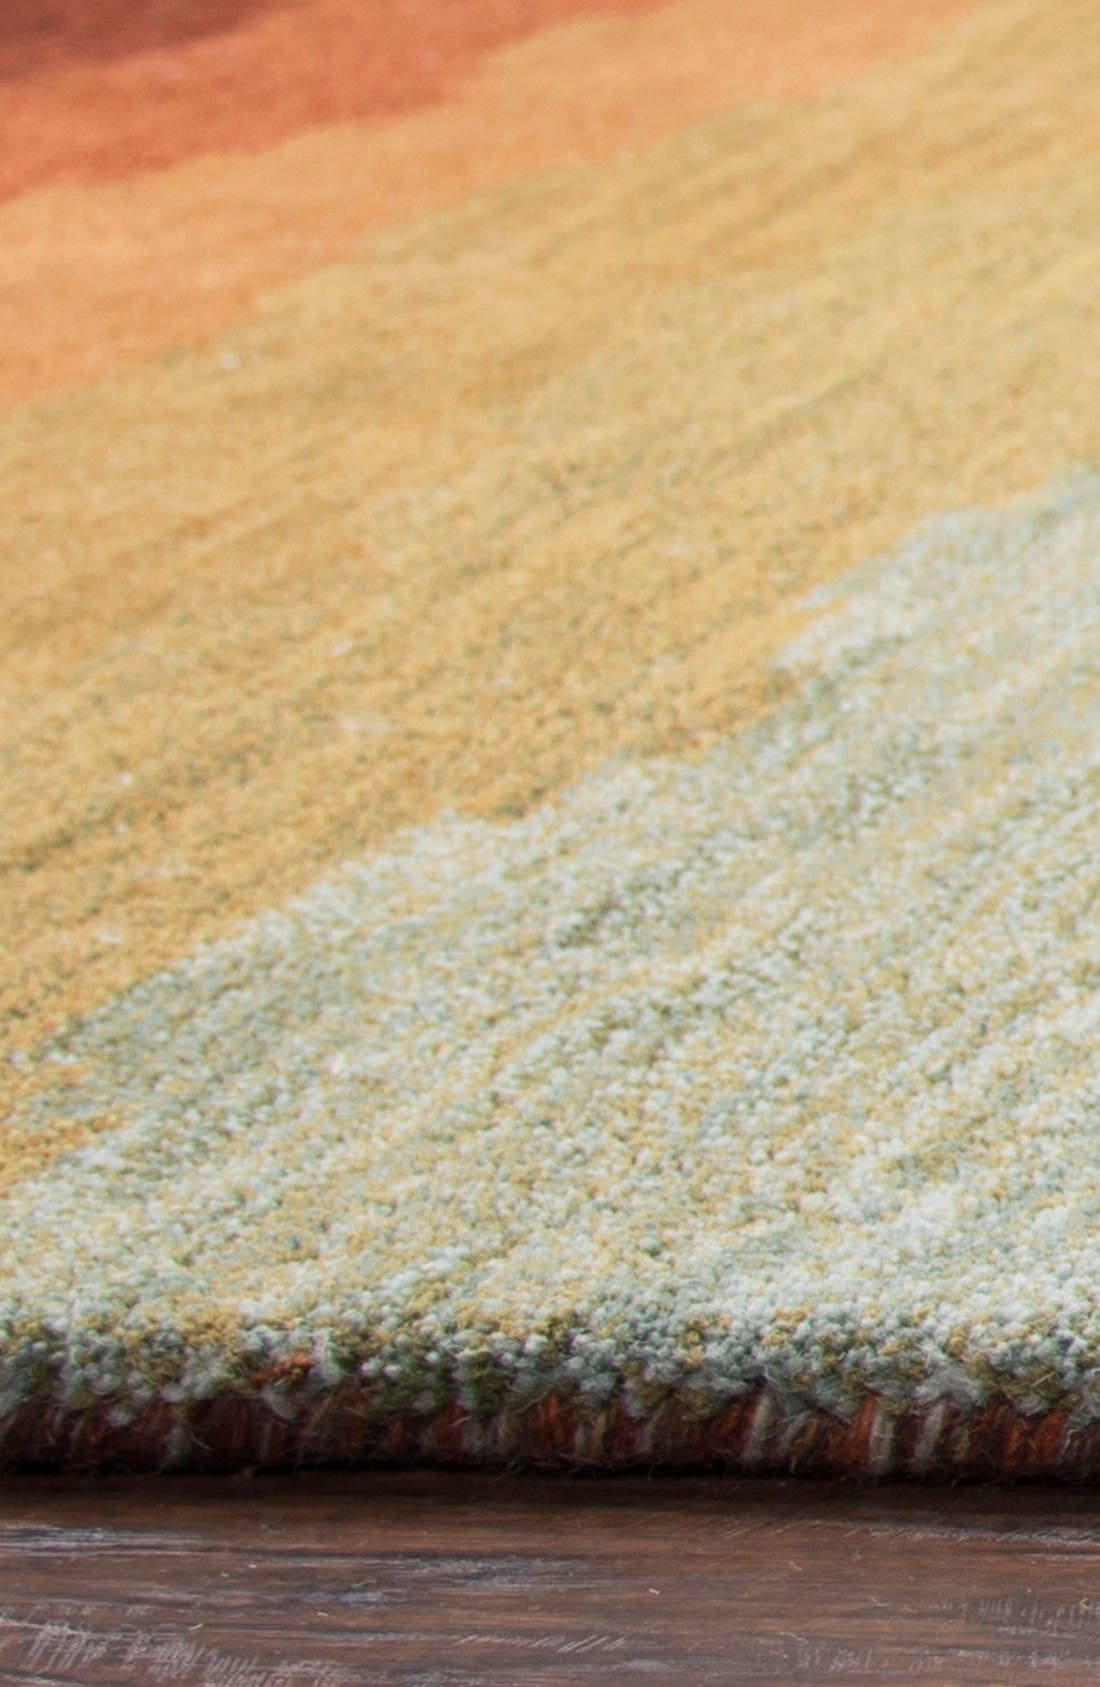 Desert Oasis Hand Tufted Wool Area Rug,                             Alternate thumbnail 4, color,                             Rust